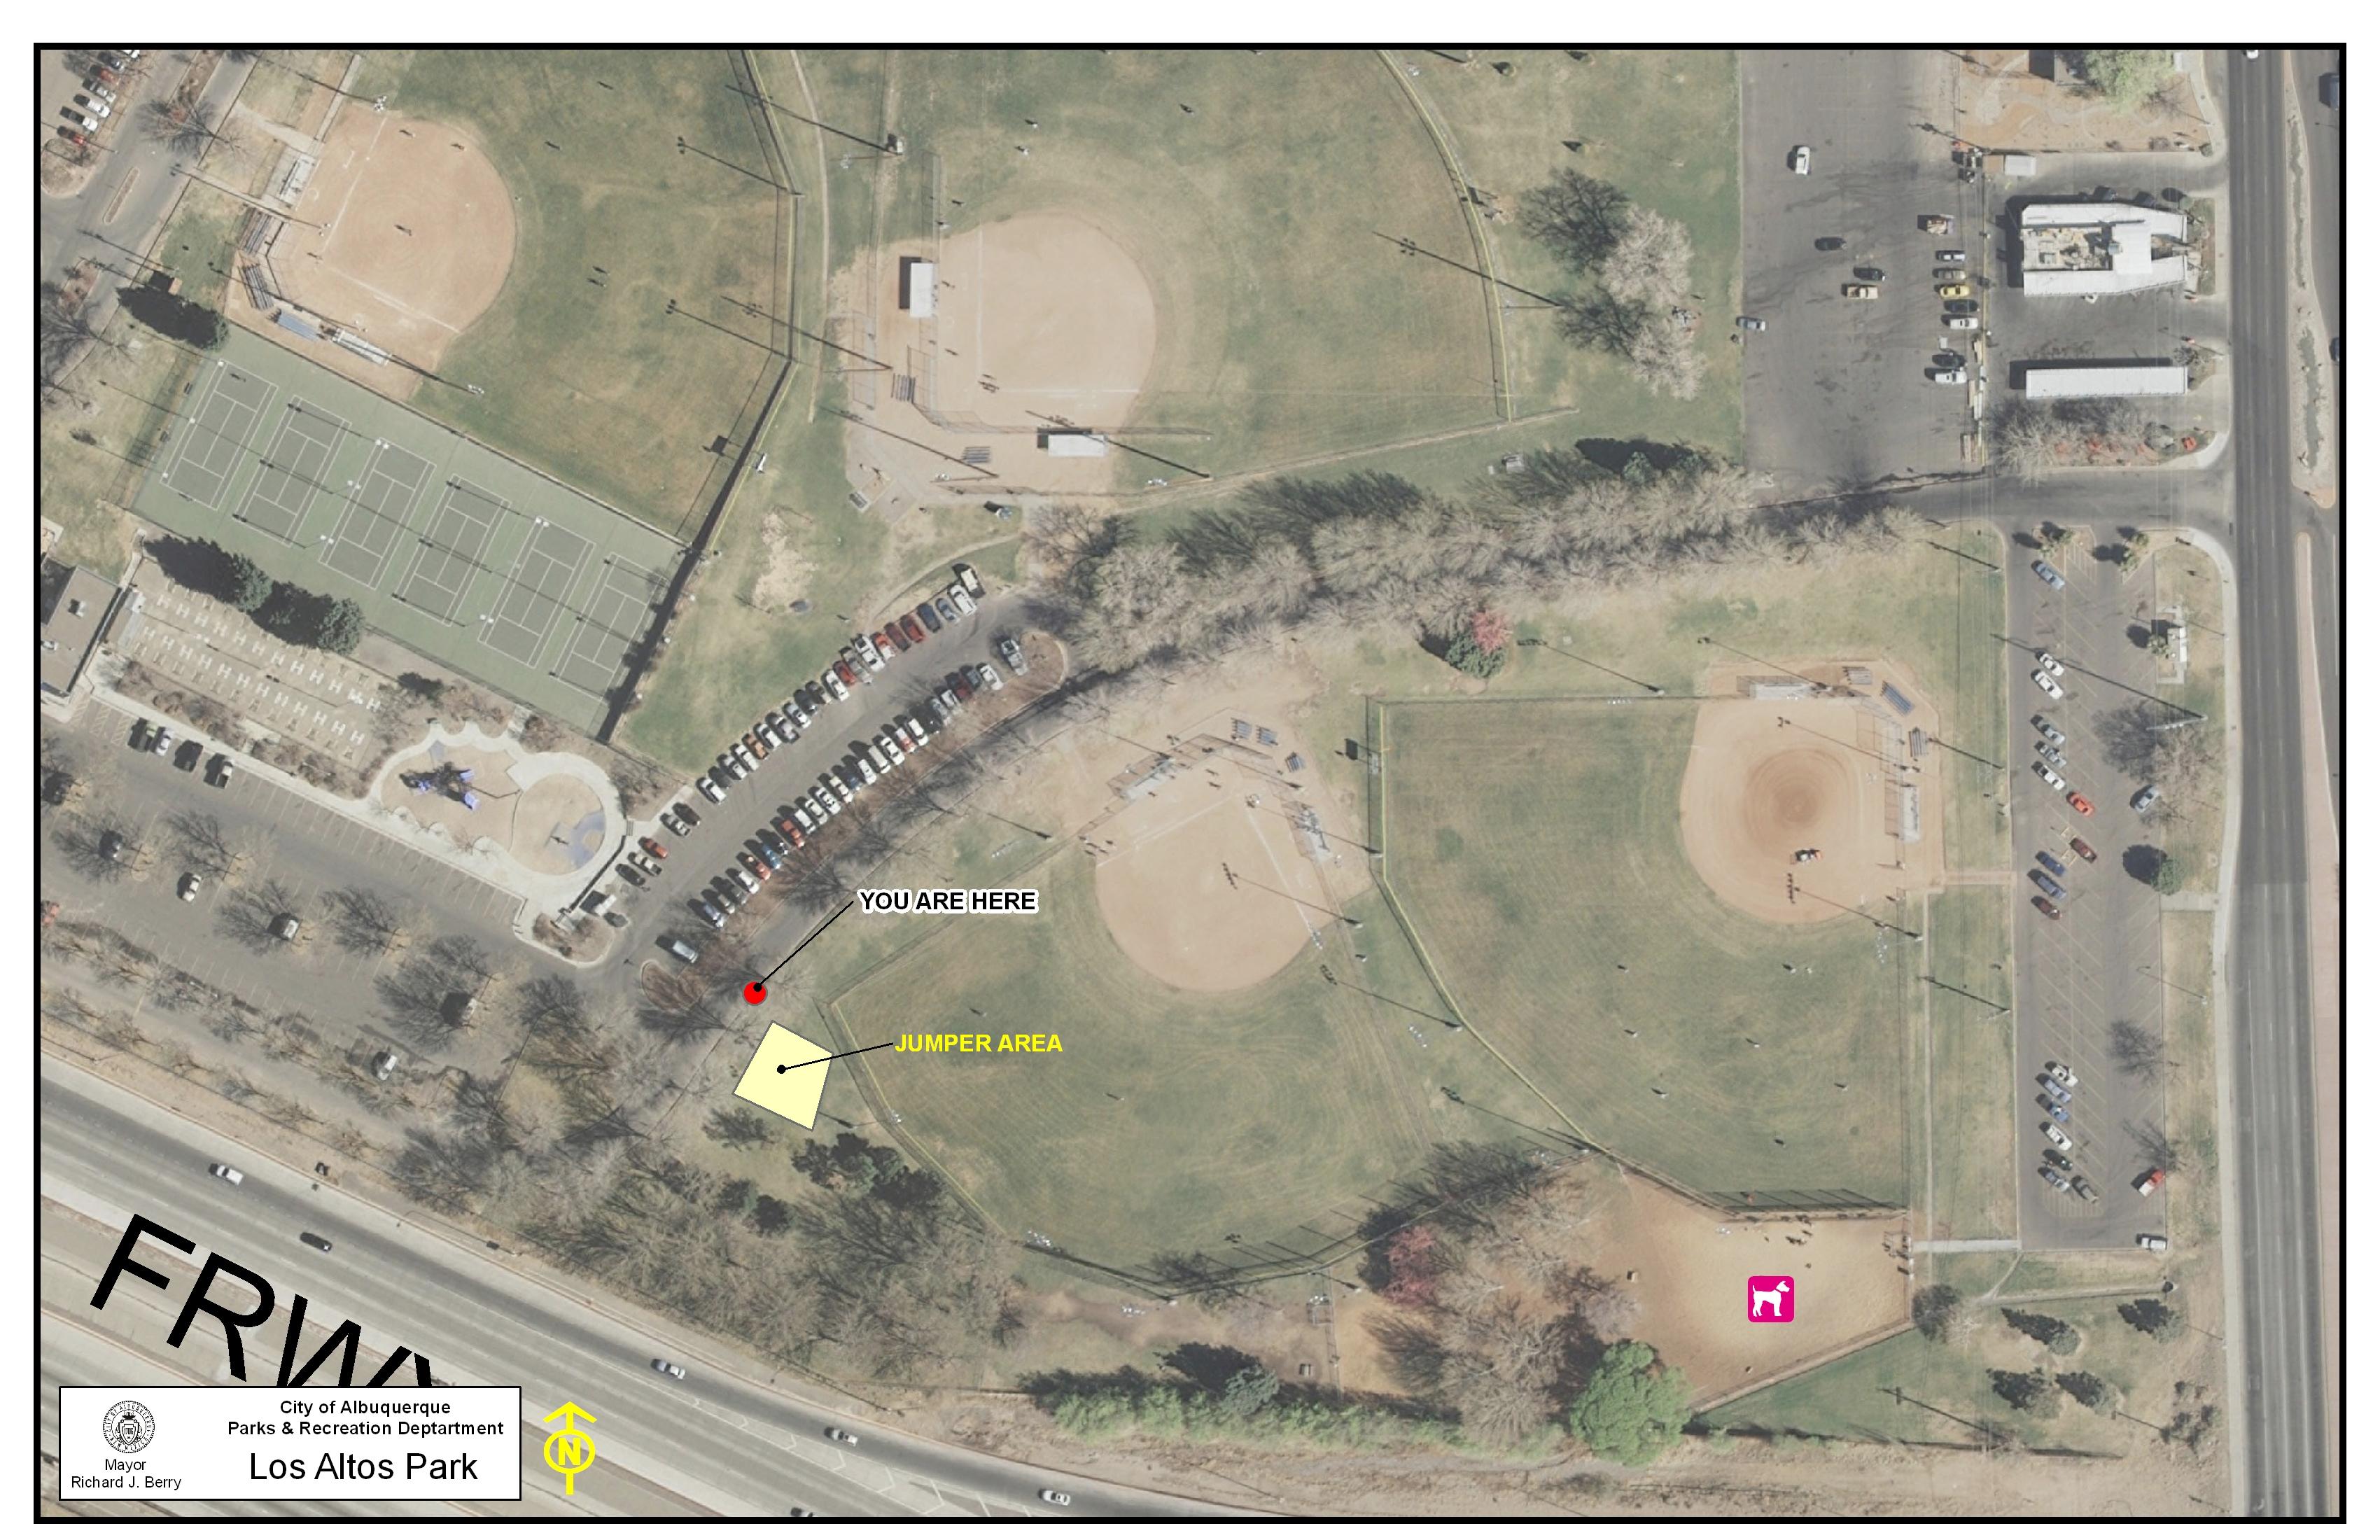 Los Altos Park Jumper Map